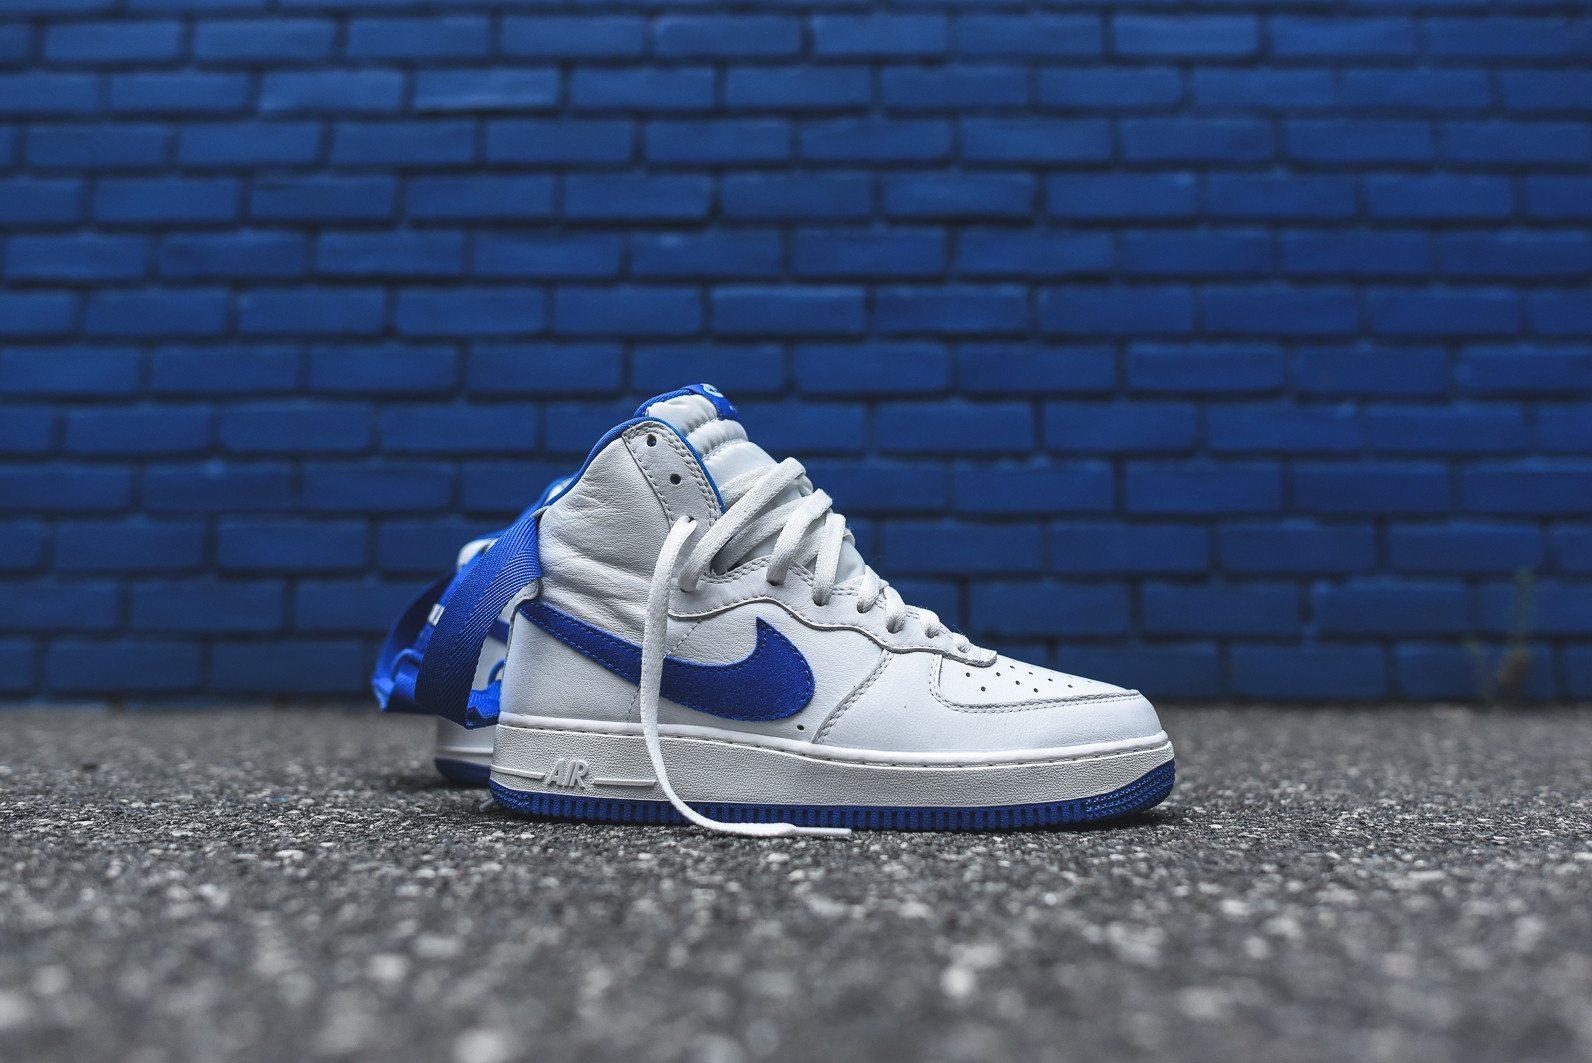 Nike Air Force 1 Hi Retro White Game Royal 11